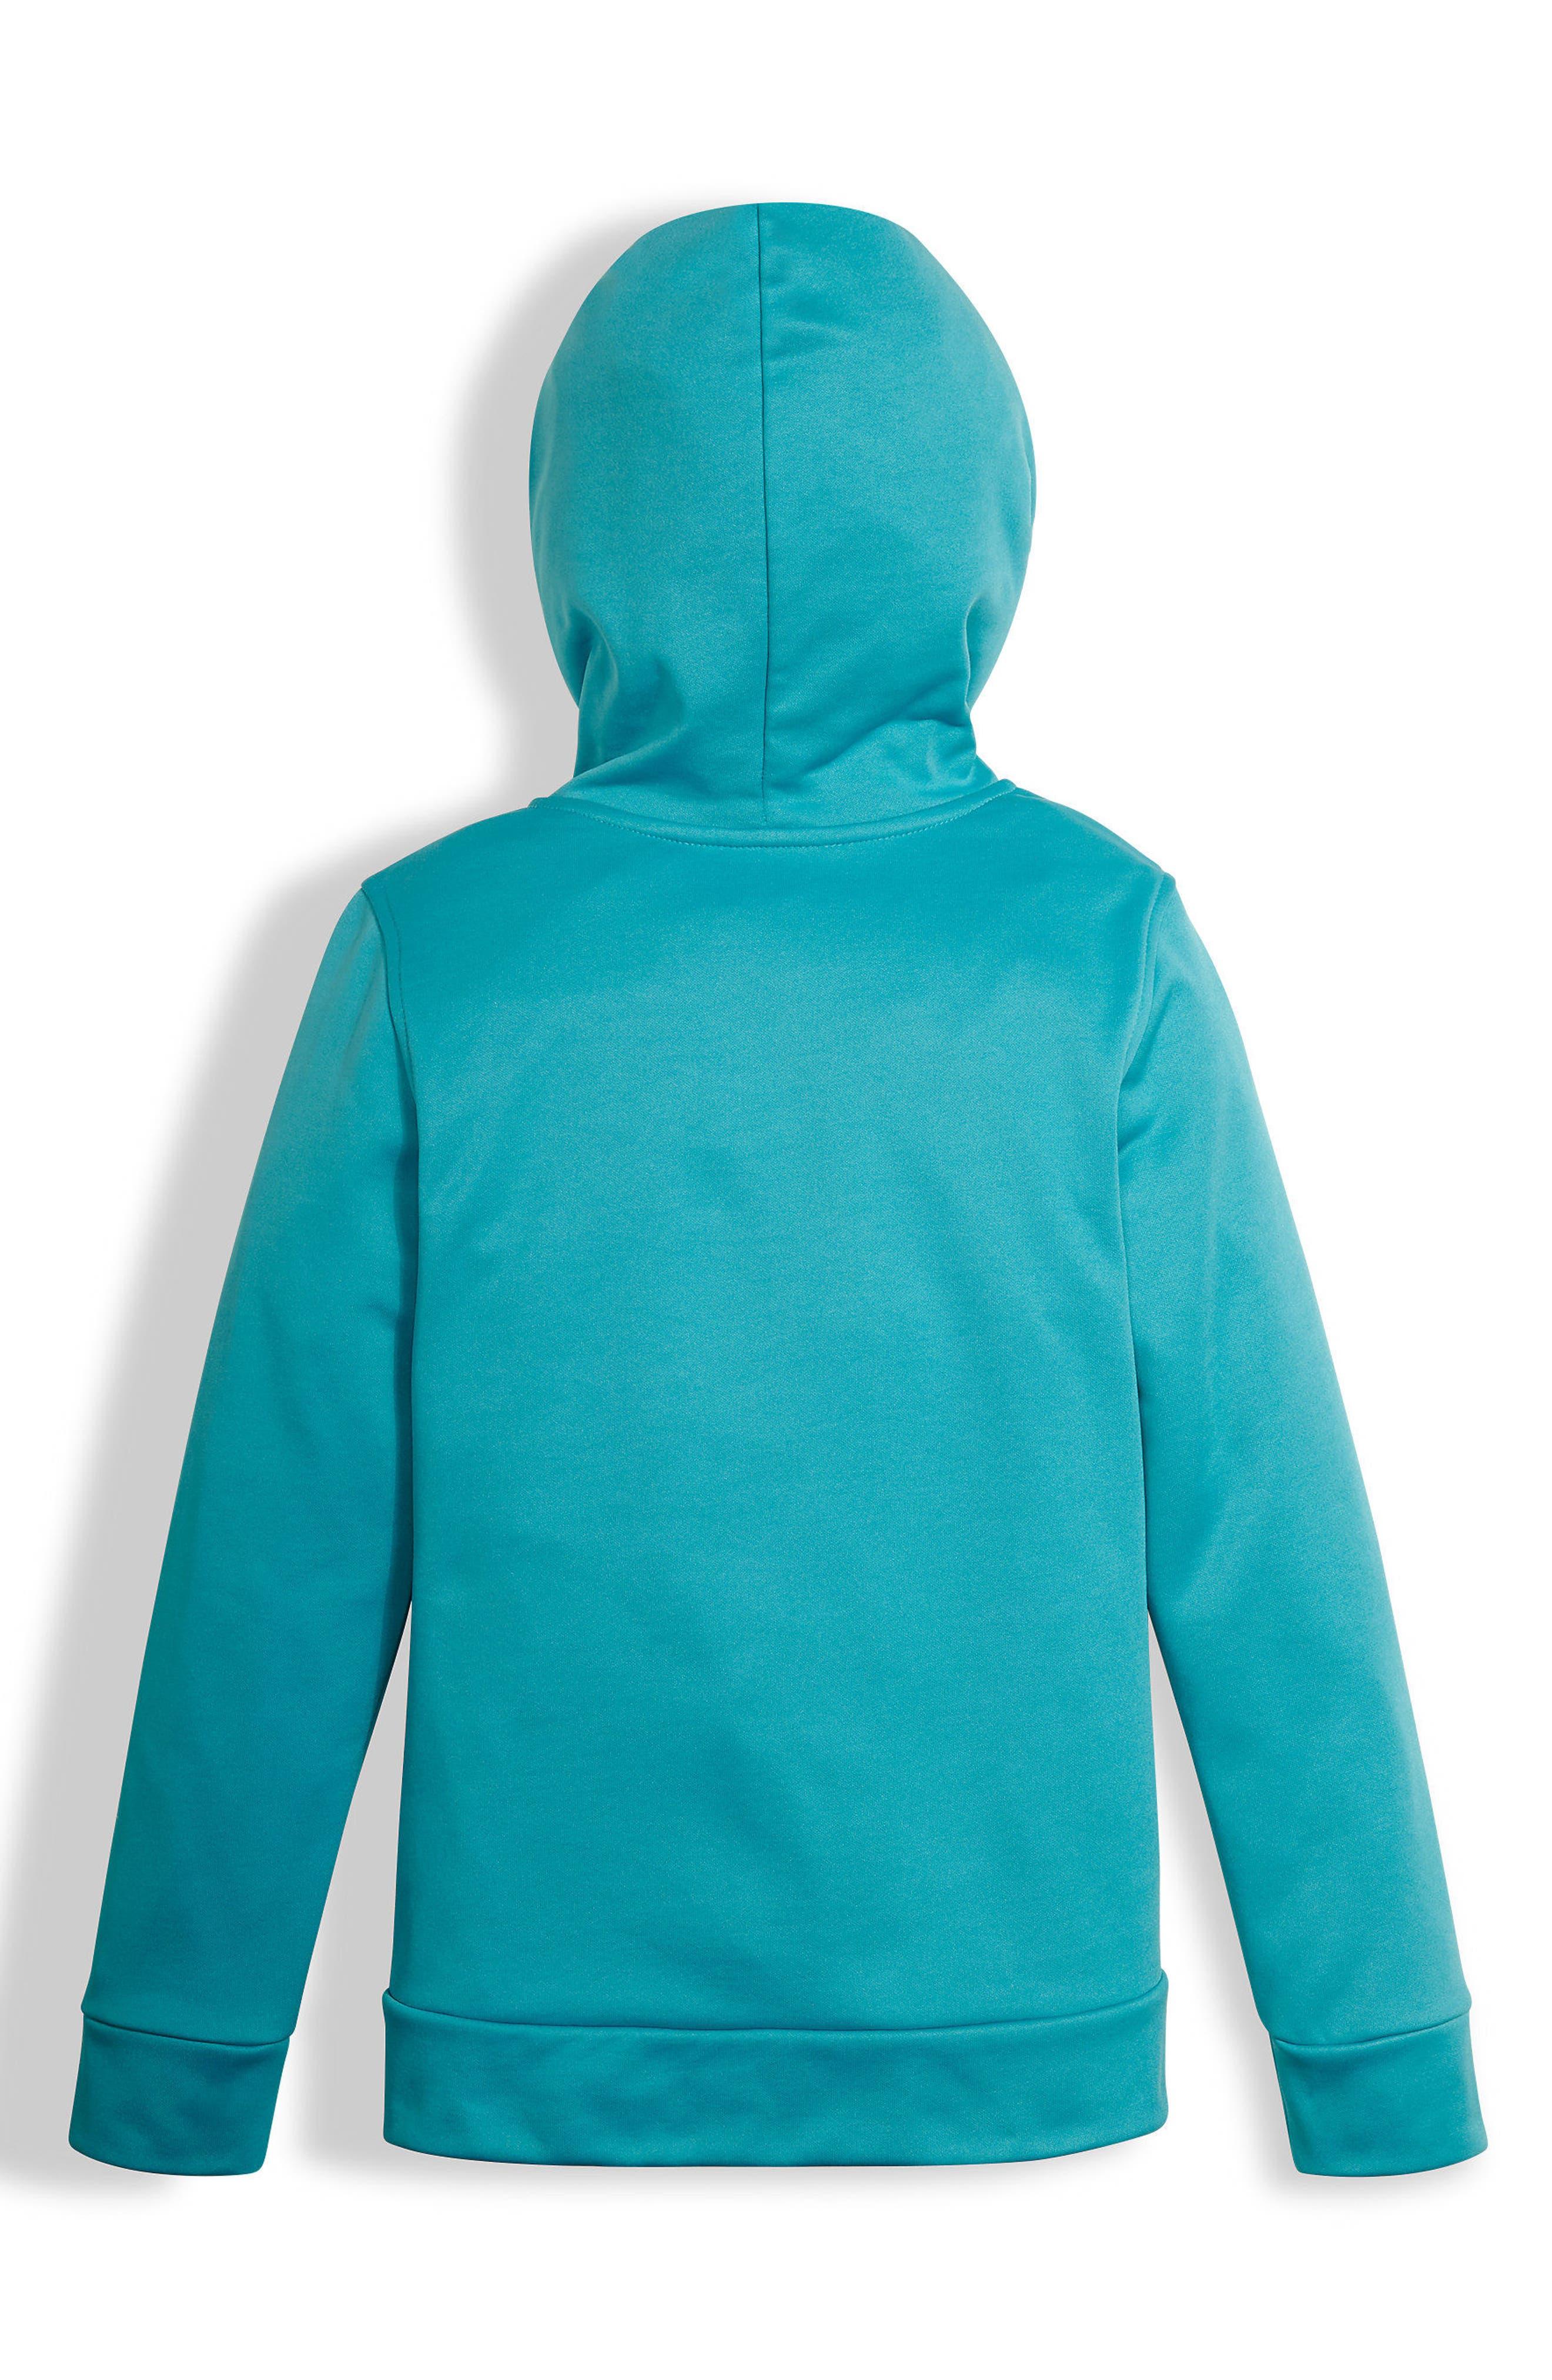 Surgent Fleece Pullover Hoodie,                         Main,                         color, 420